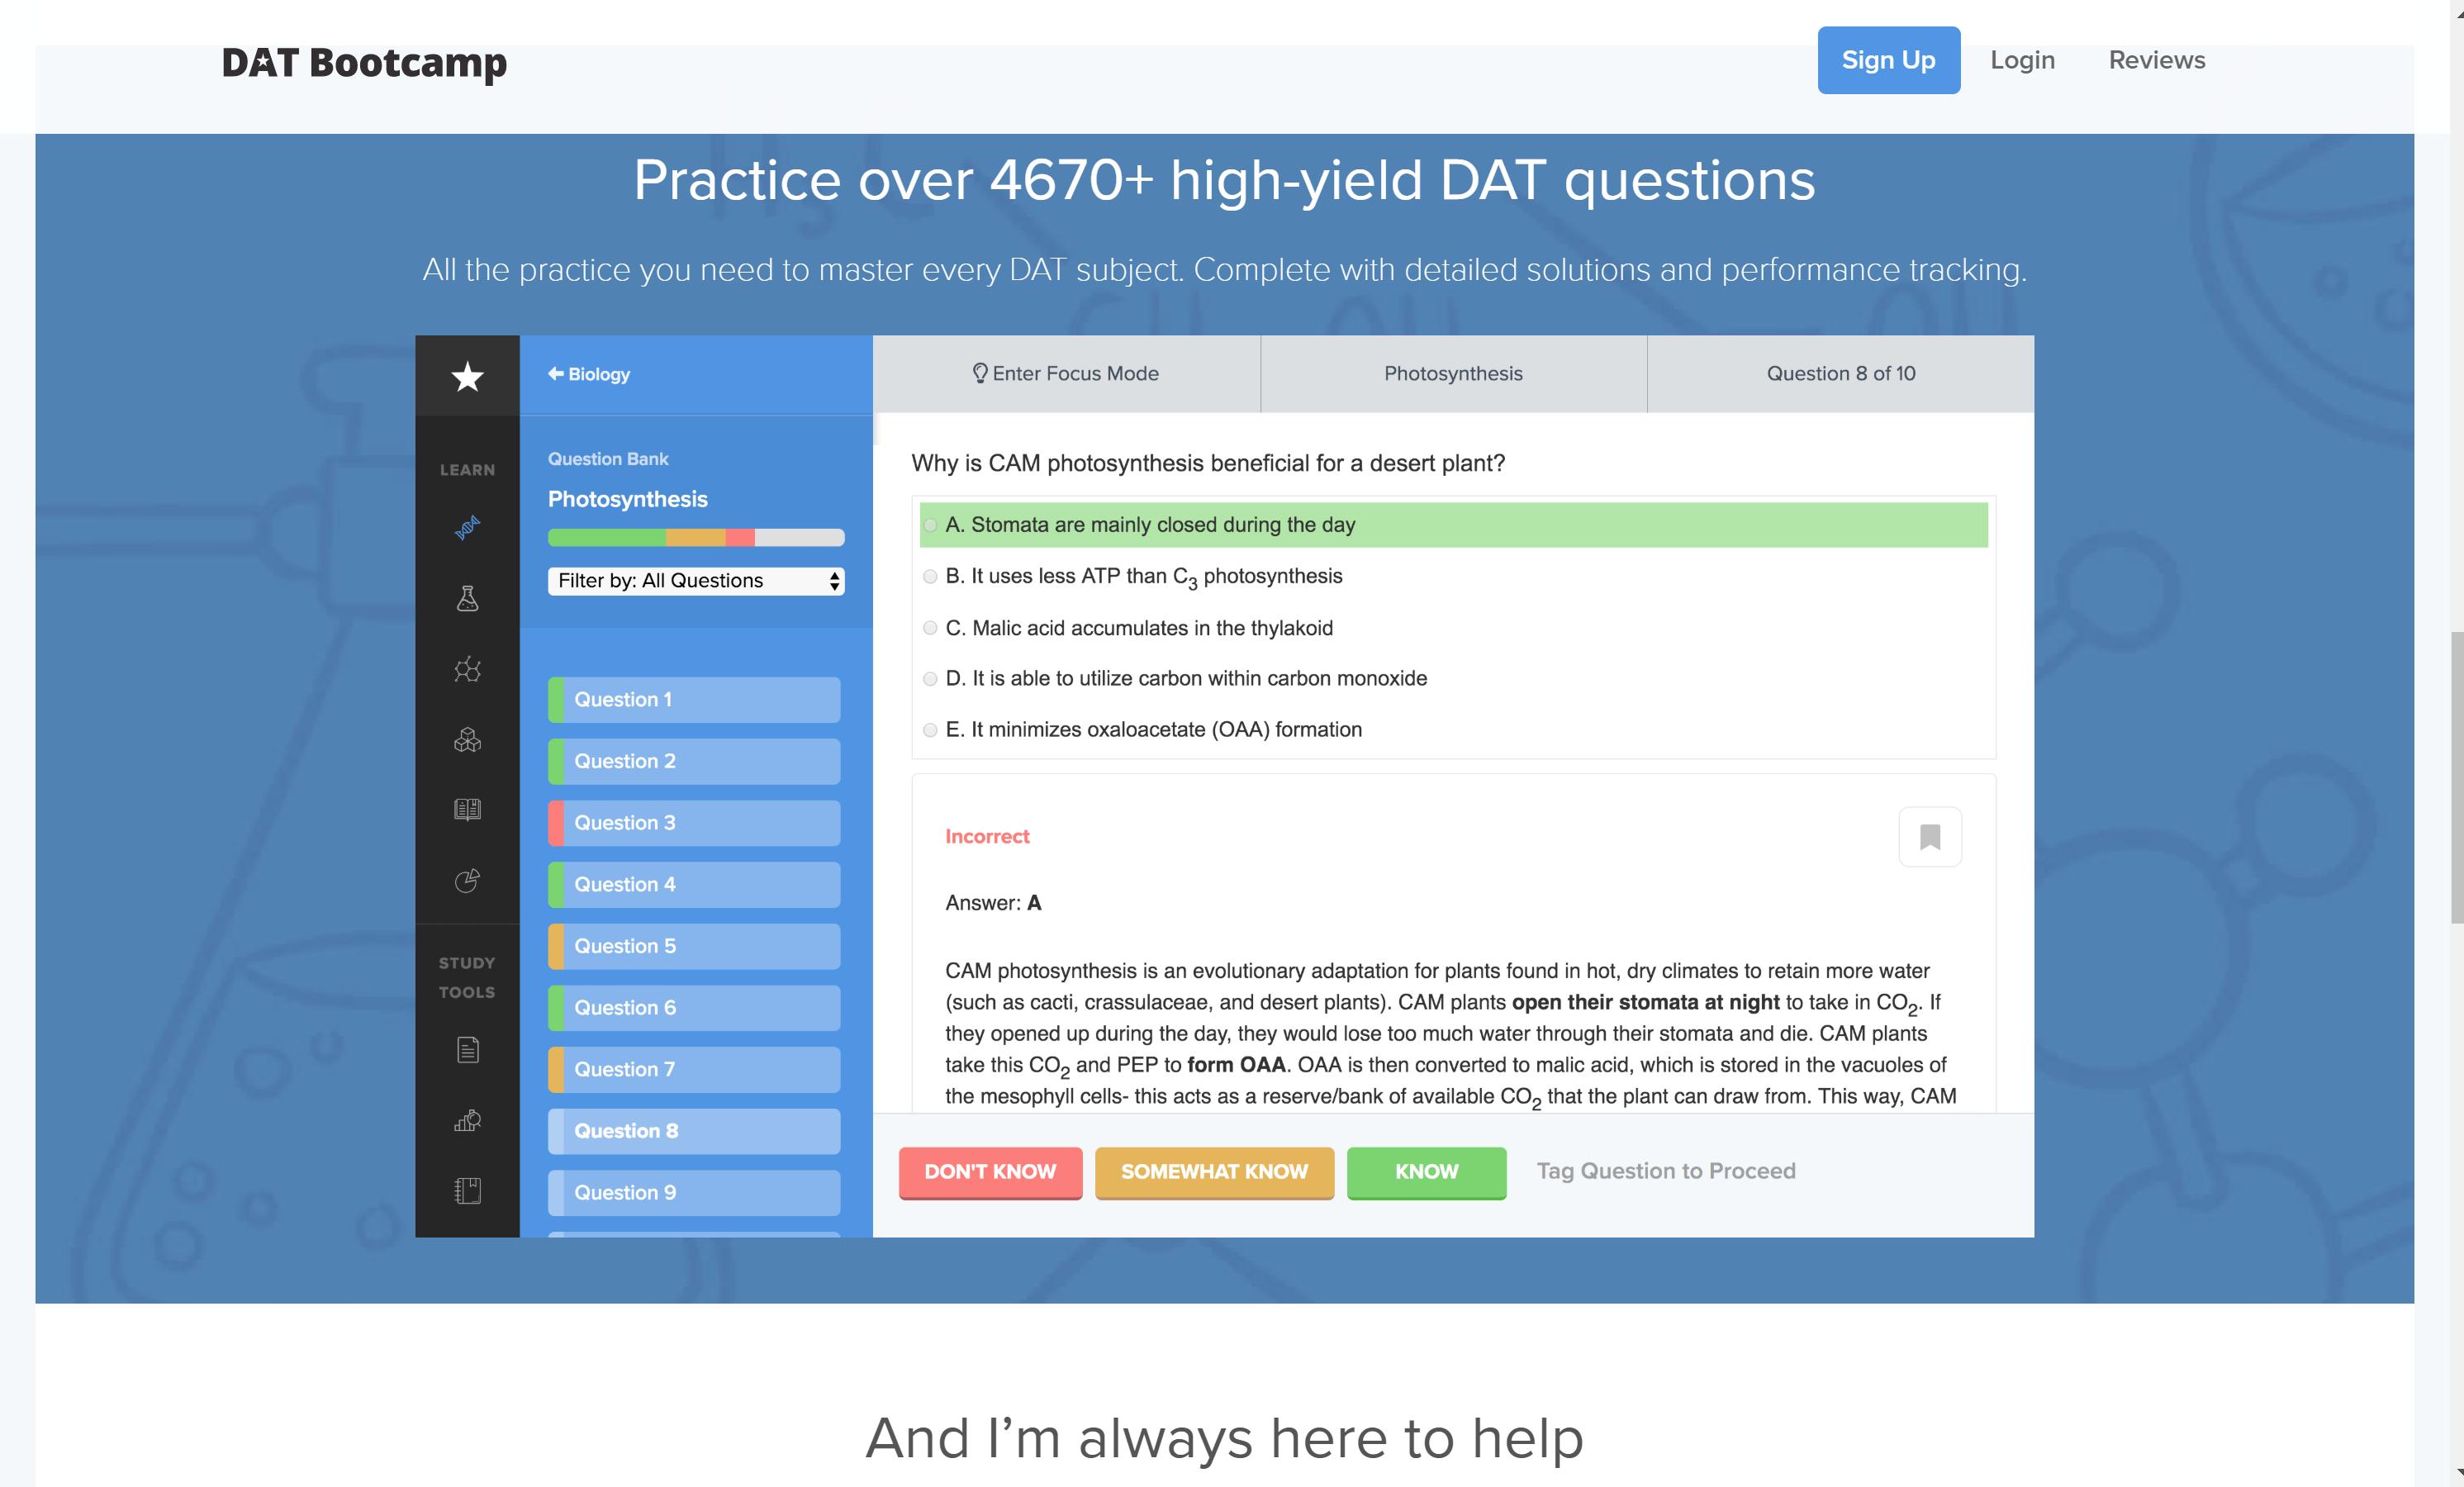 Best DAT Prep courses online